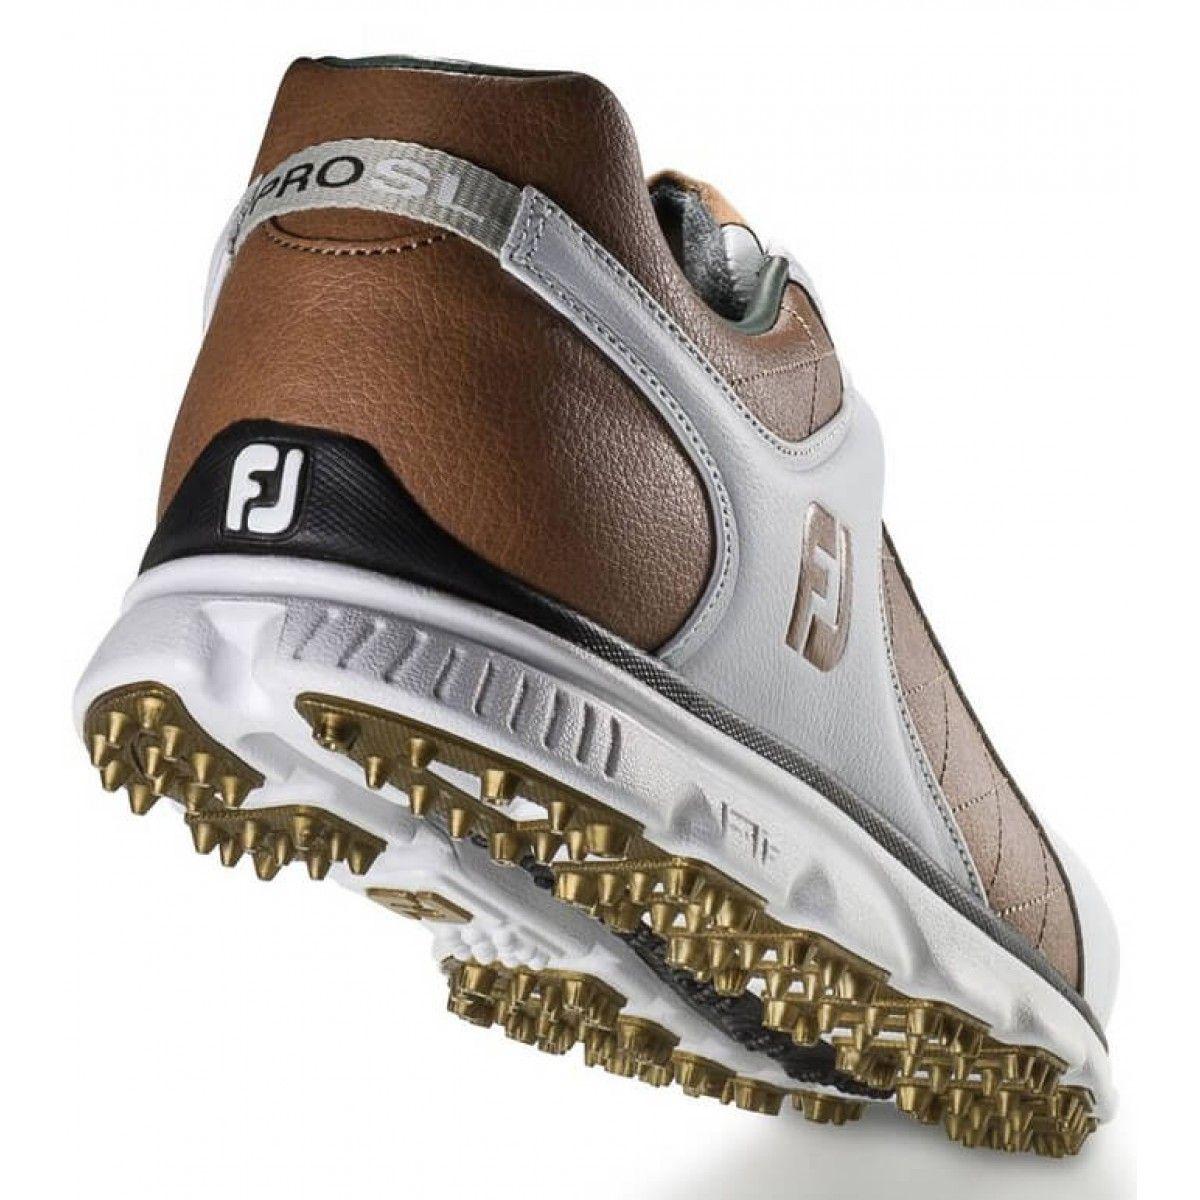 Footjoy Pro Sl Spikeless Golf Shoes Mens Select Color Size Spikeless Golf Sl Best Golf Shoes Footjoy Footjoy Golf Shoes